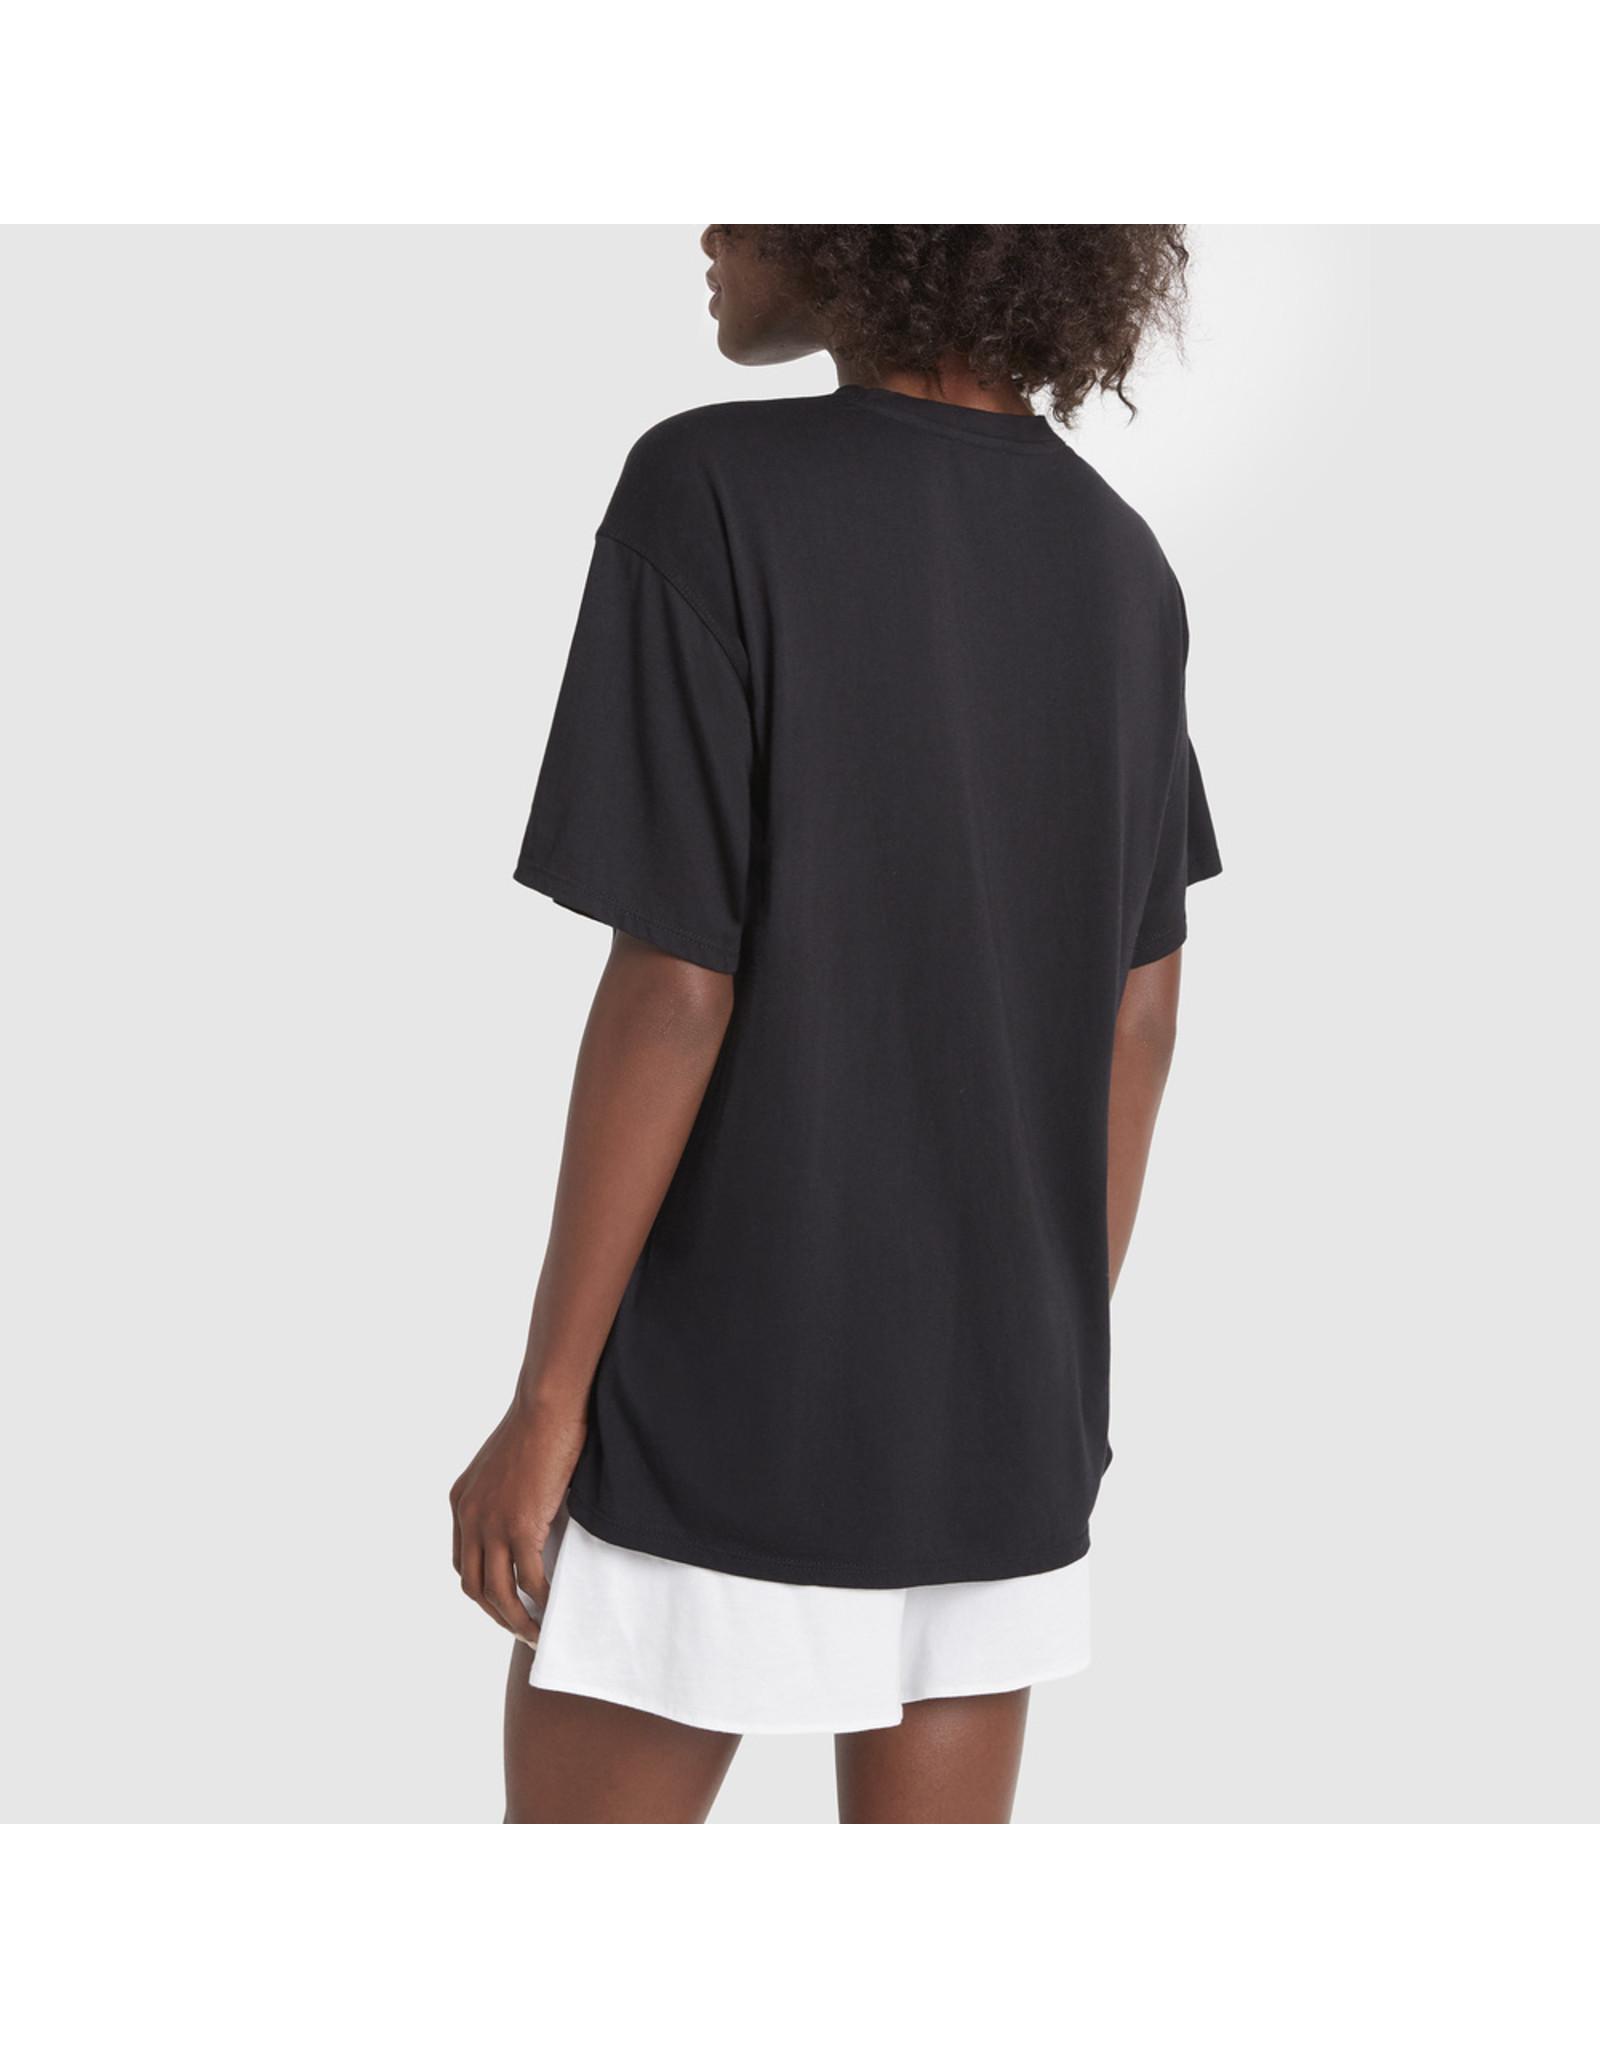 G. Sport G. Sport Oversize Boyfriend Tee (Color: Black, Size: XL)